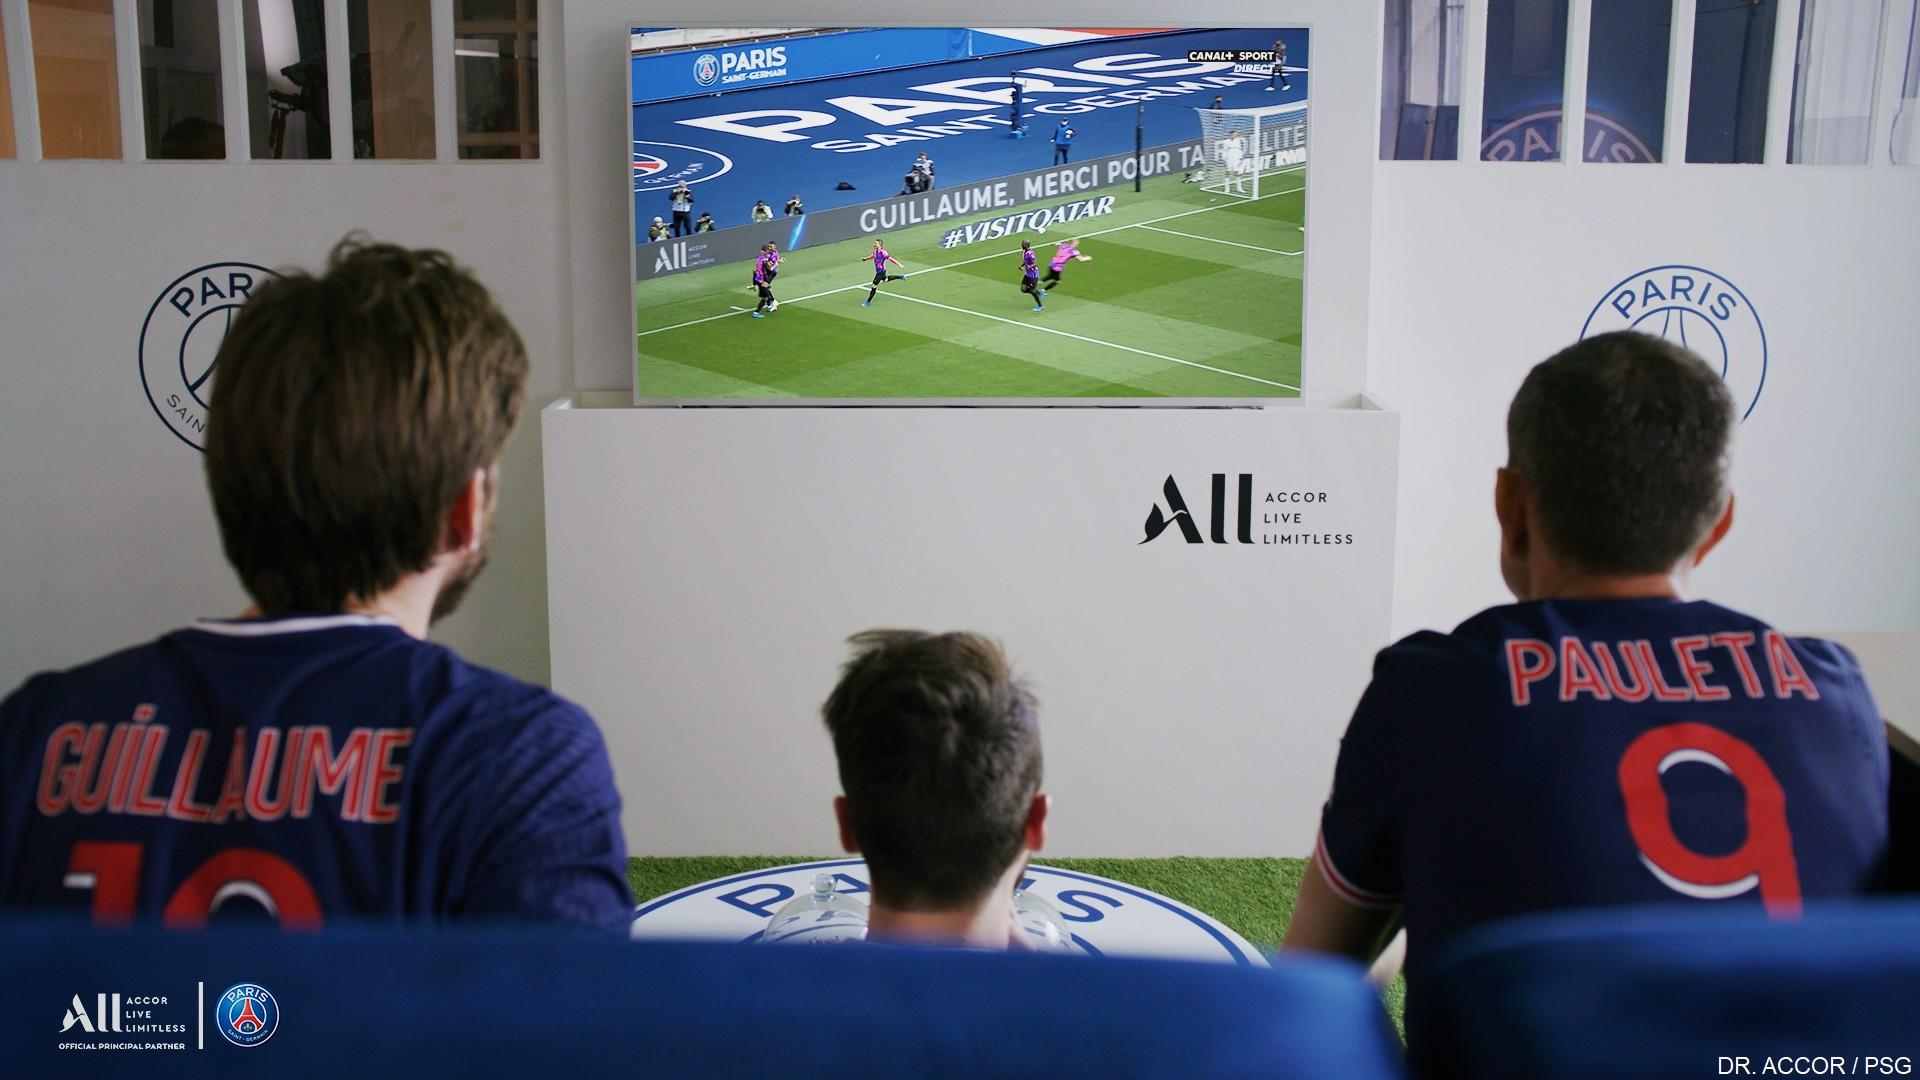 Accor ALL x PSG (football) Opé Parc des Princes 2021